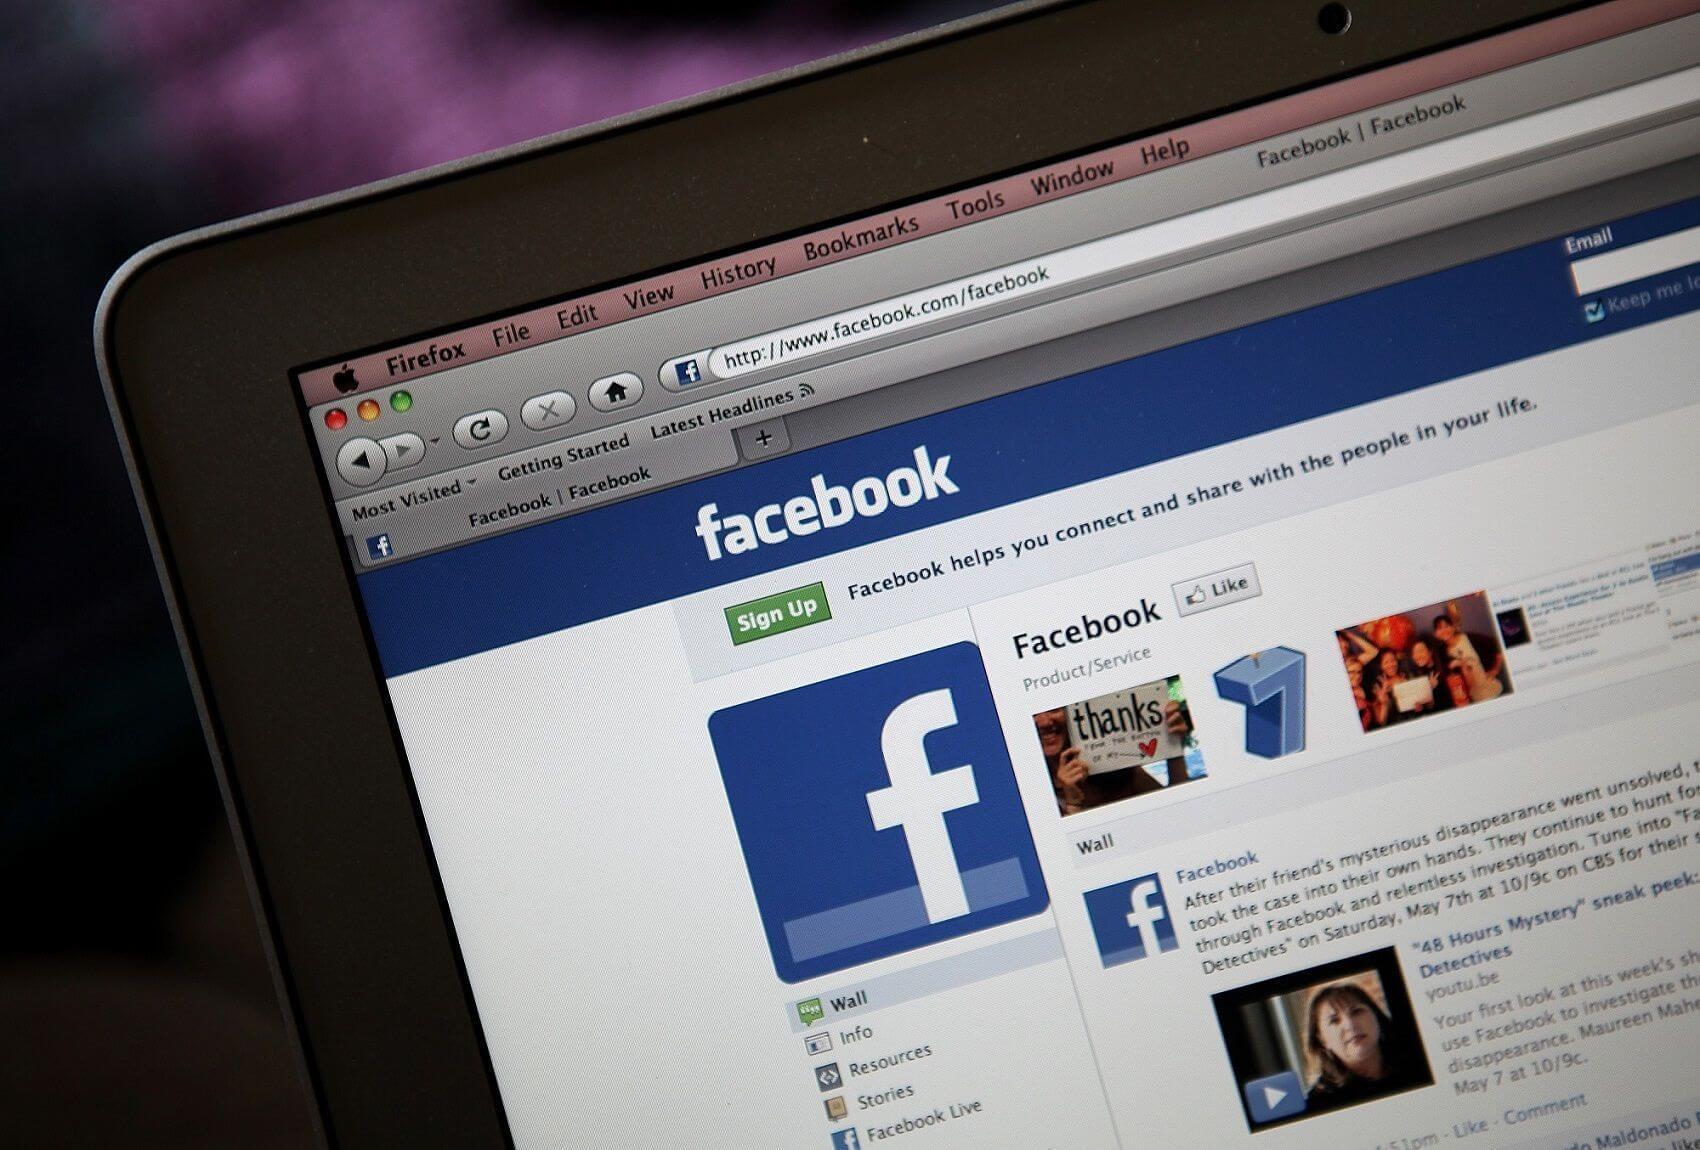 closing facebook 2 56b350523df78cdfa004b589 - Tutorial: Como esconder os amigos que adiciono no Facebook